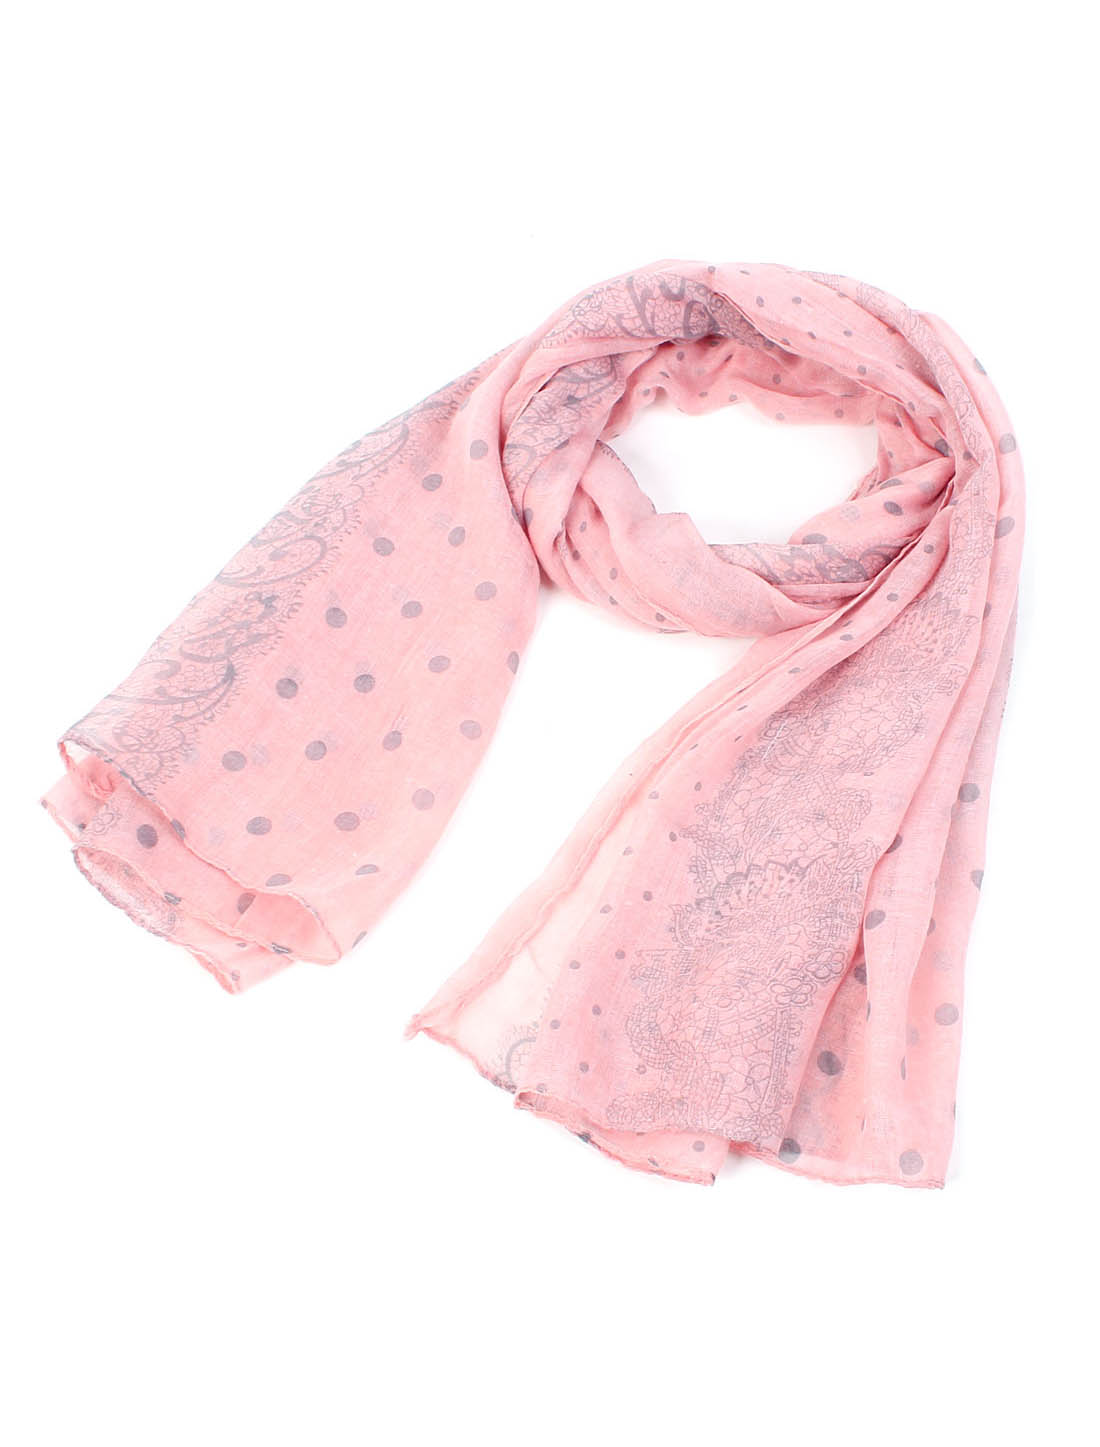 Women Fashion Soft Fabric Dots Floral Prints Long Scarf Shawl Wrap Black Pink